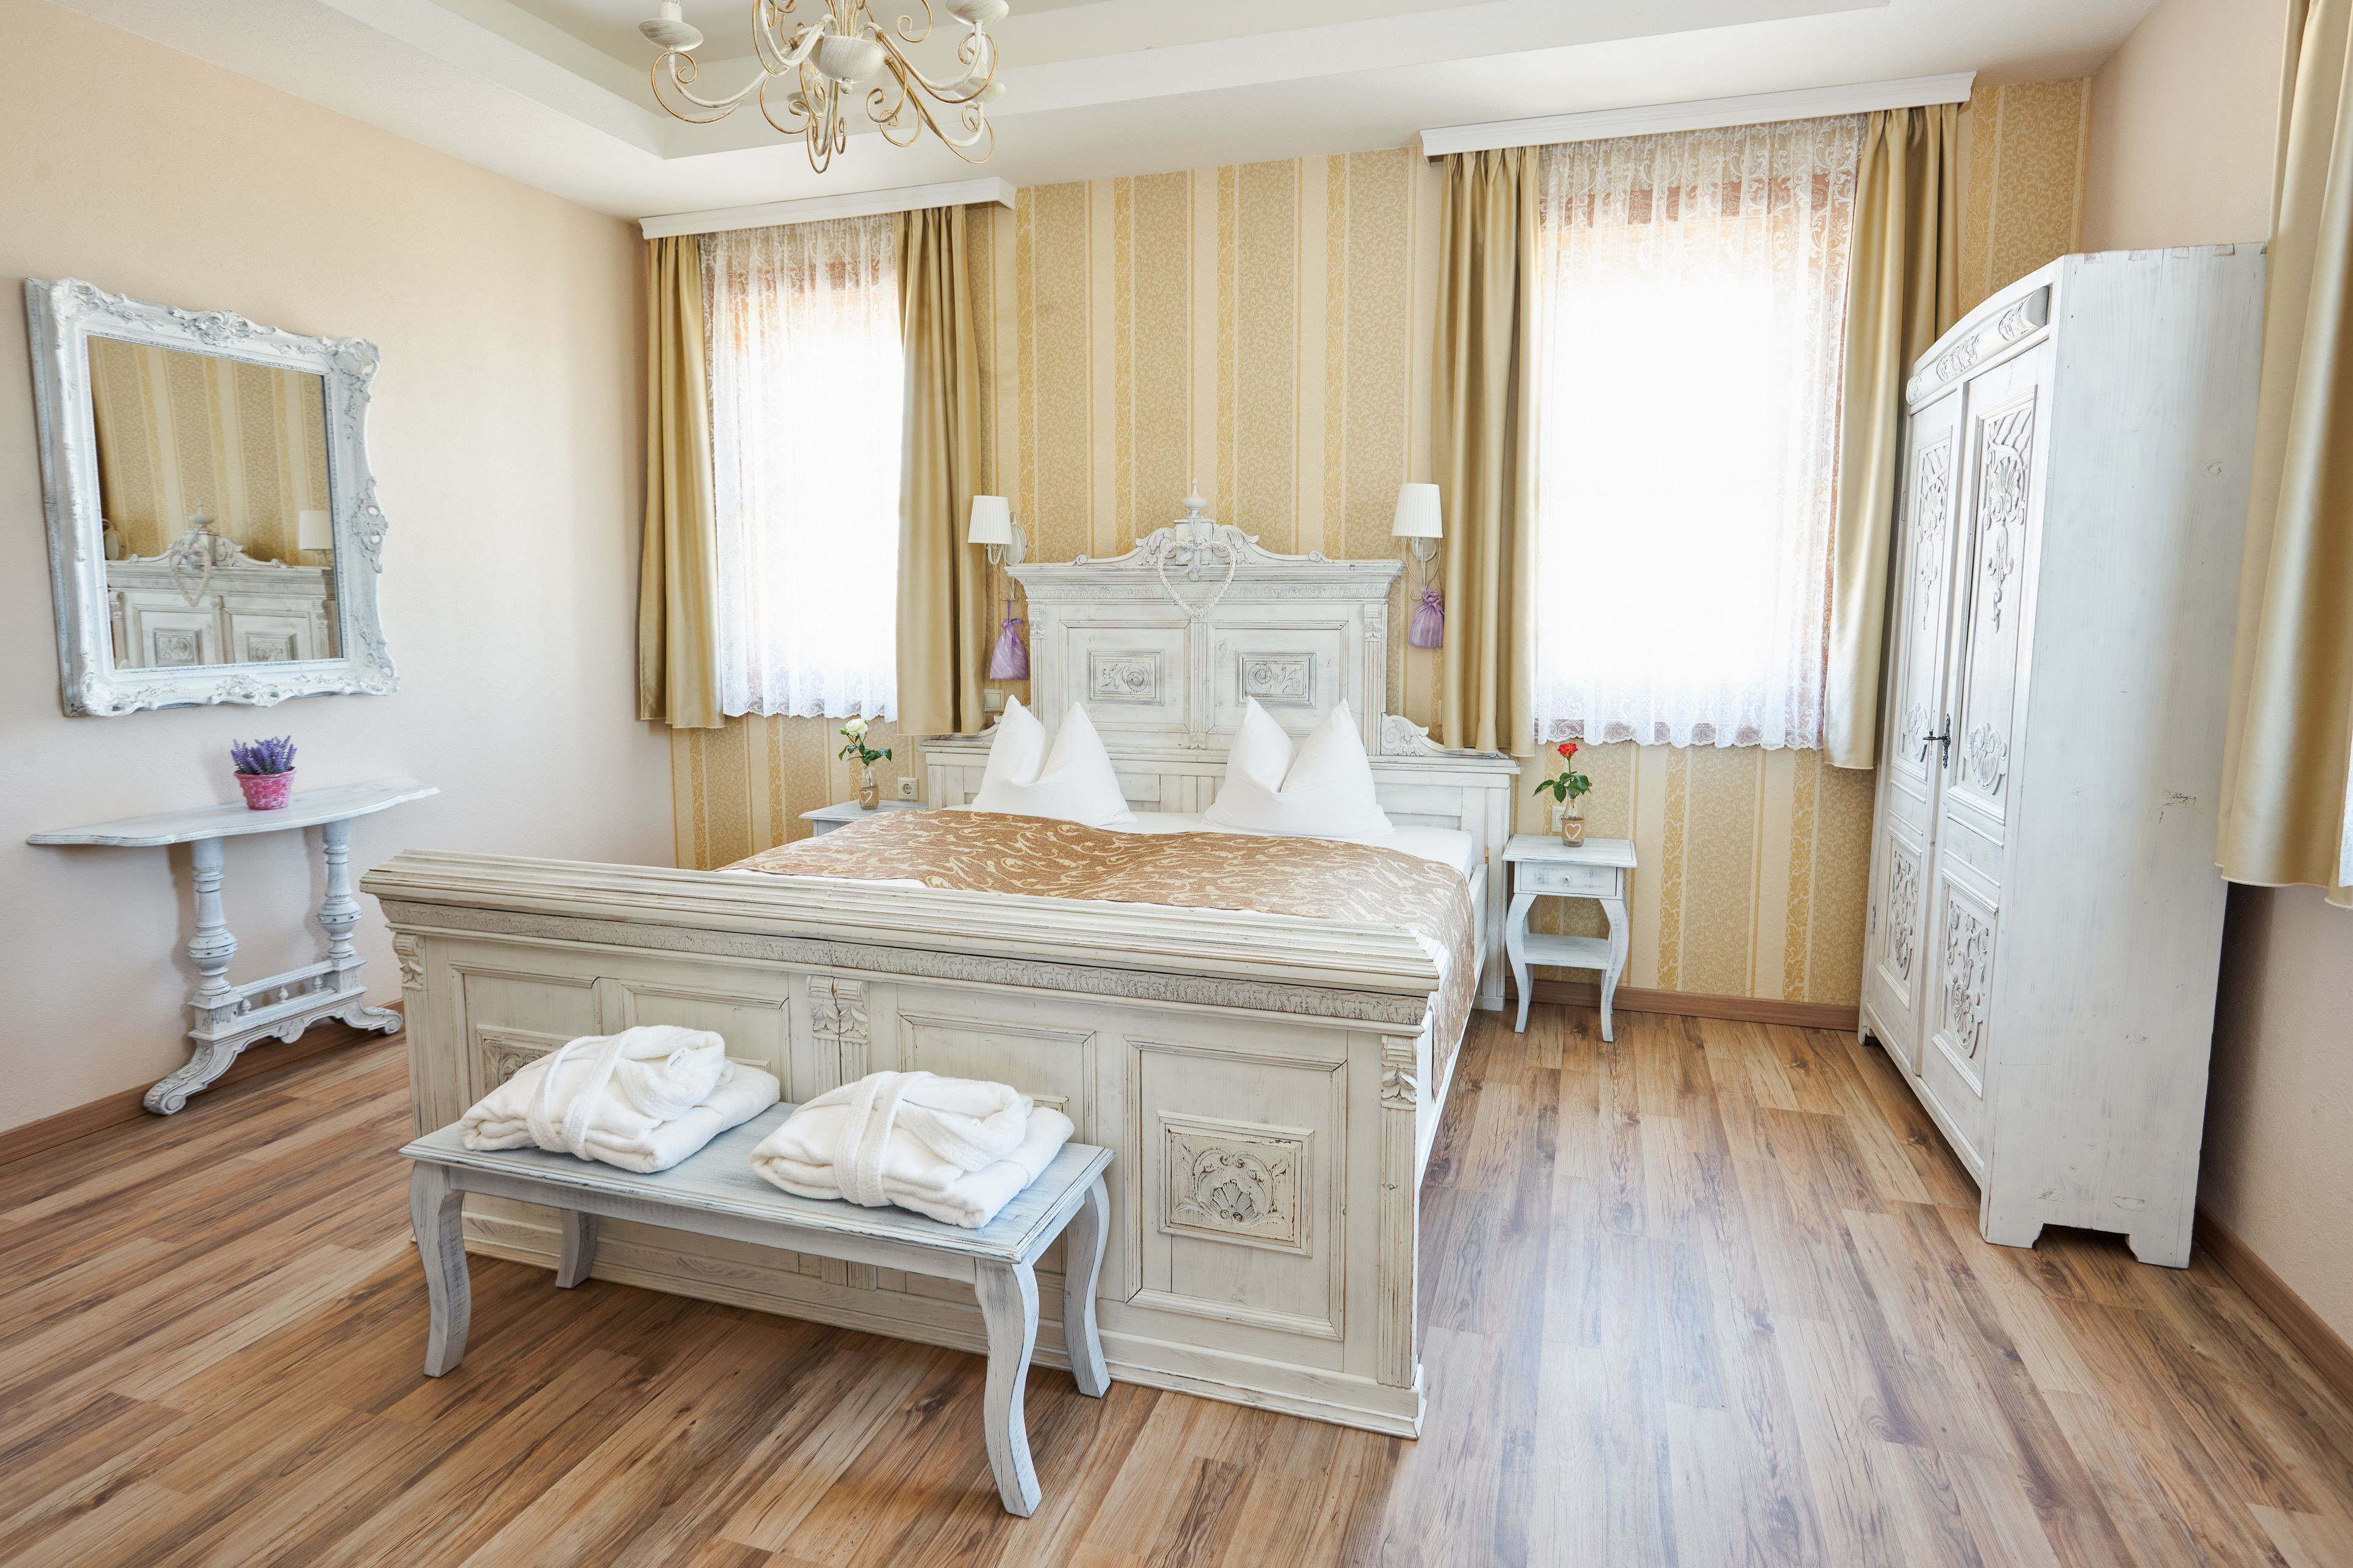 8 wide hardwood flooring of how does luxury vinyl flooring differ from standard vinyl within hotel room 840458542 5aefb33e3de42300389ed58d